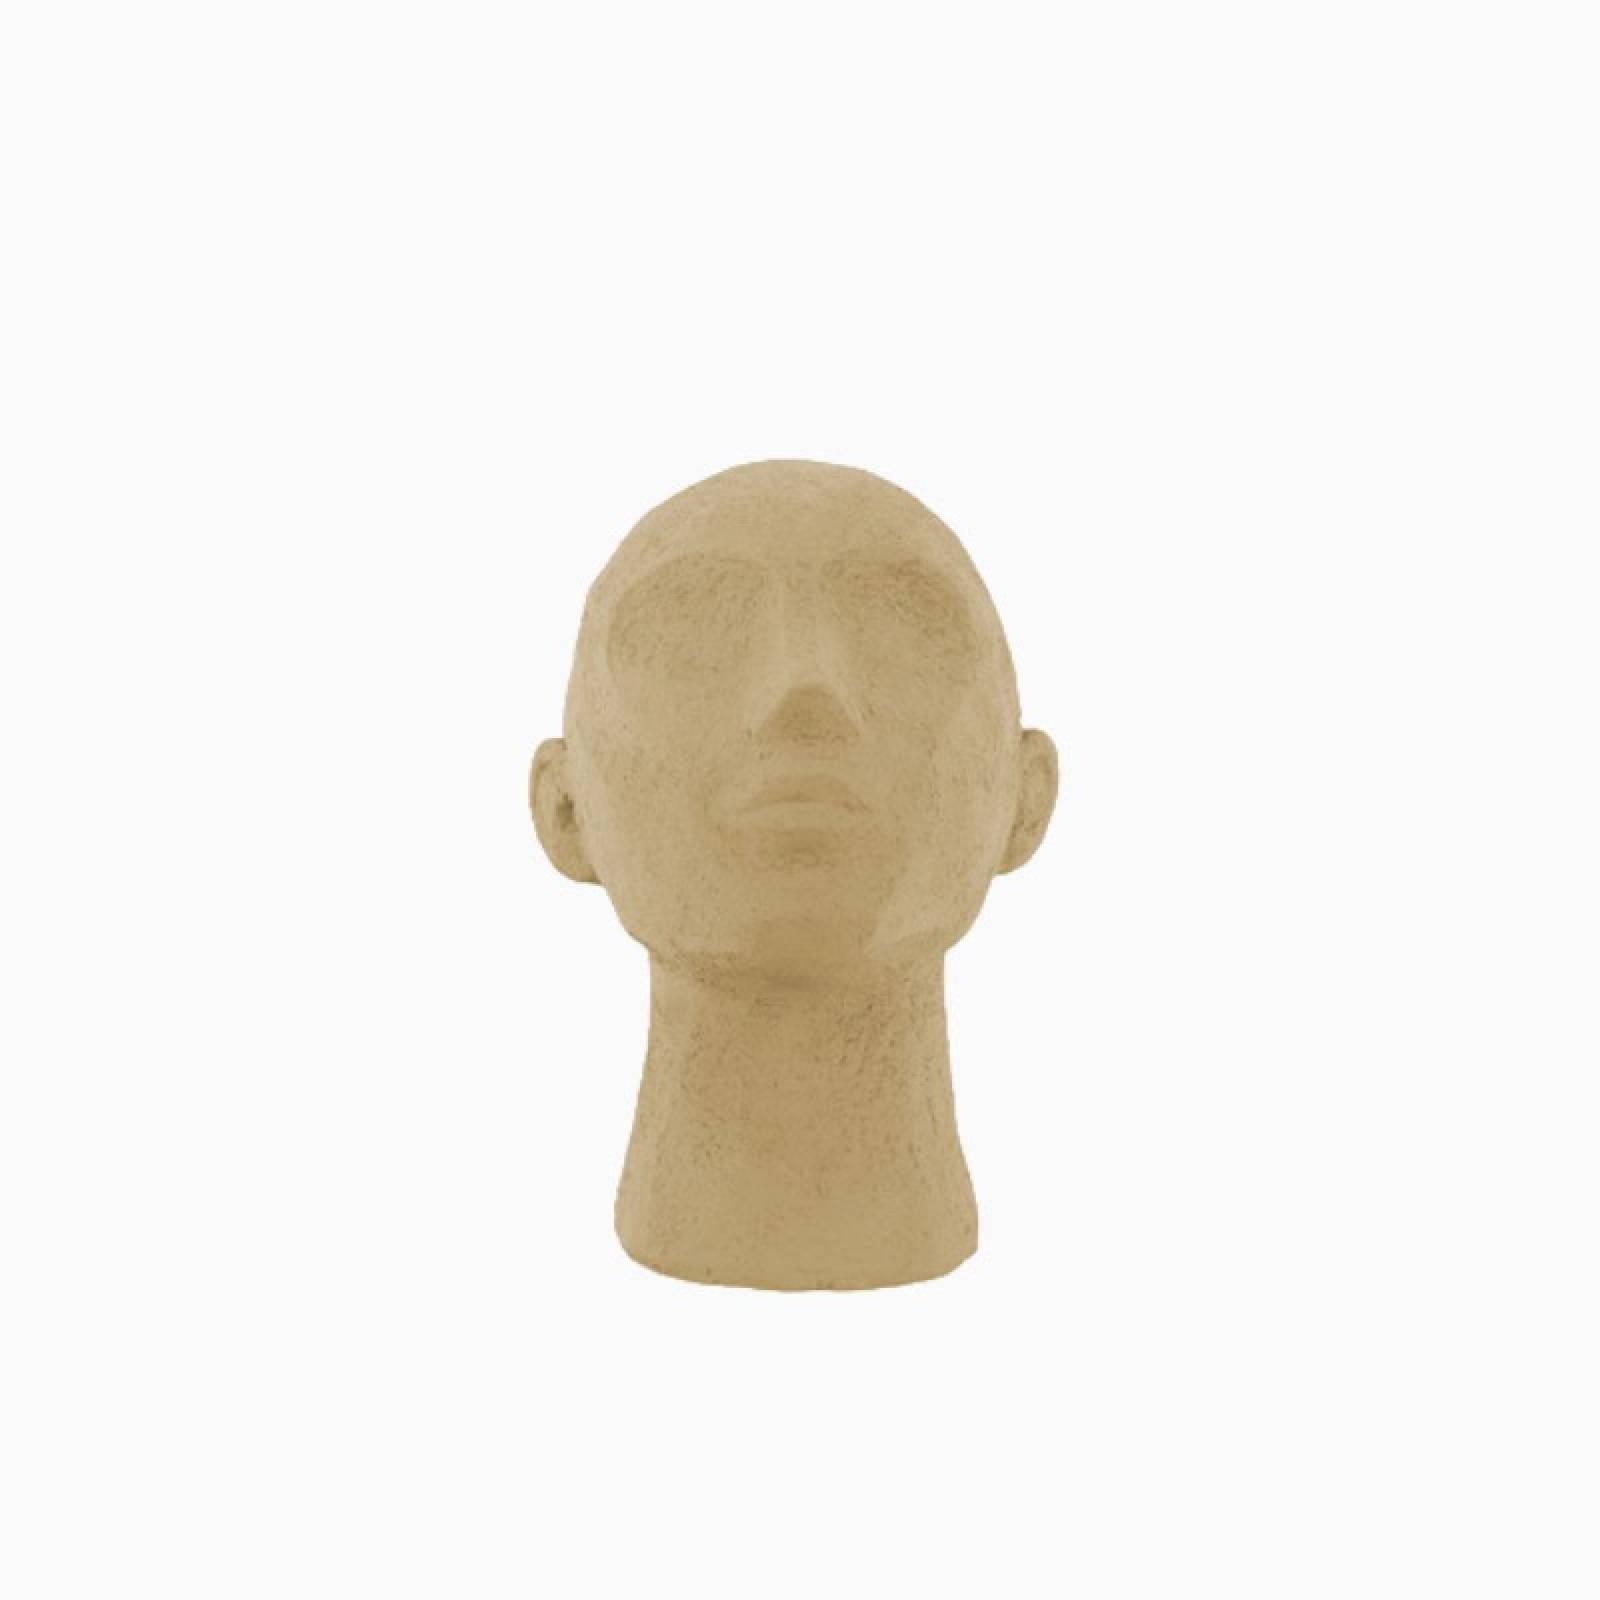 Gazing Head Model In Sand Brown